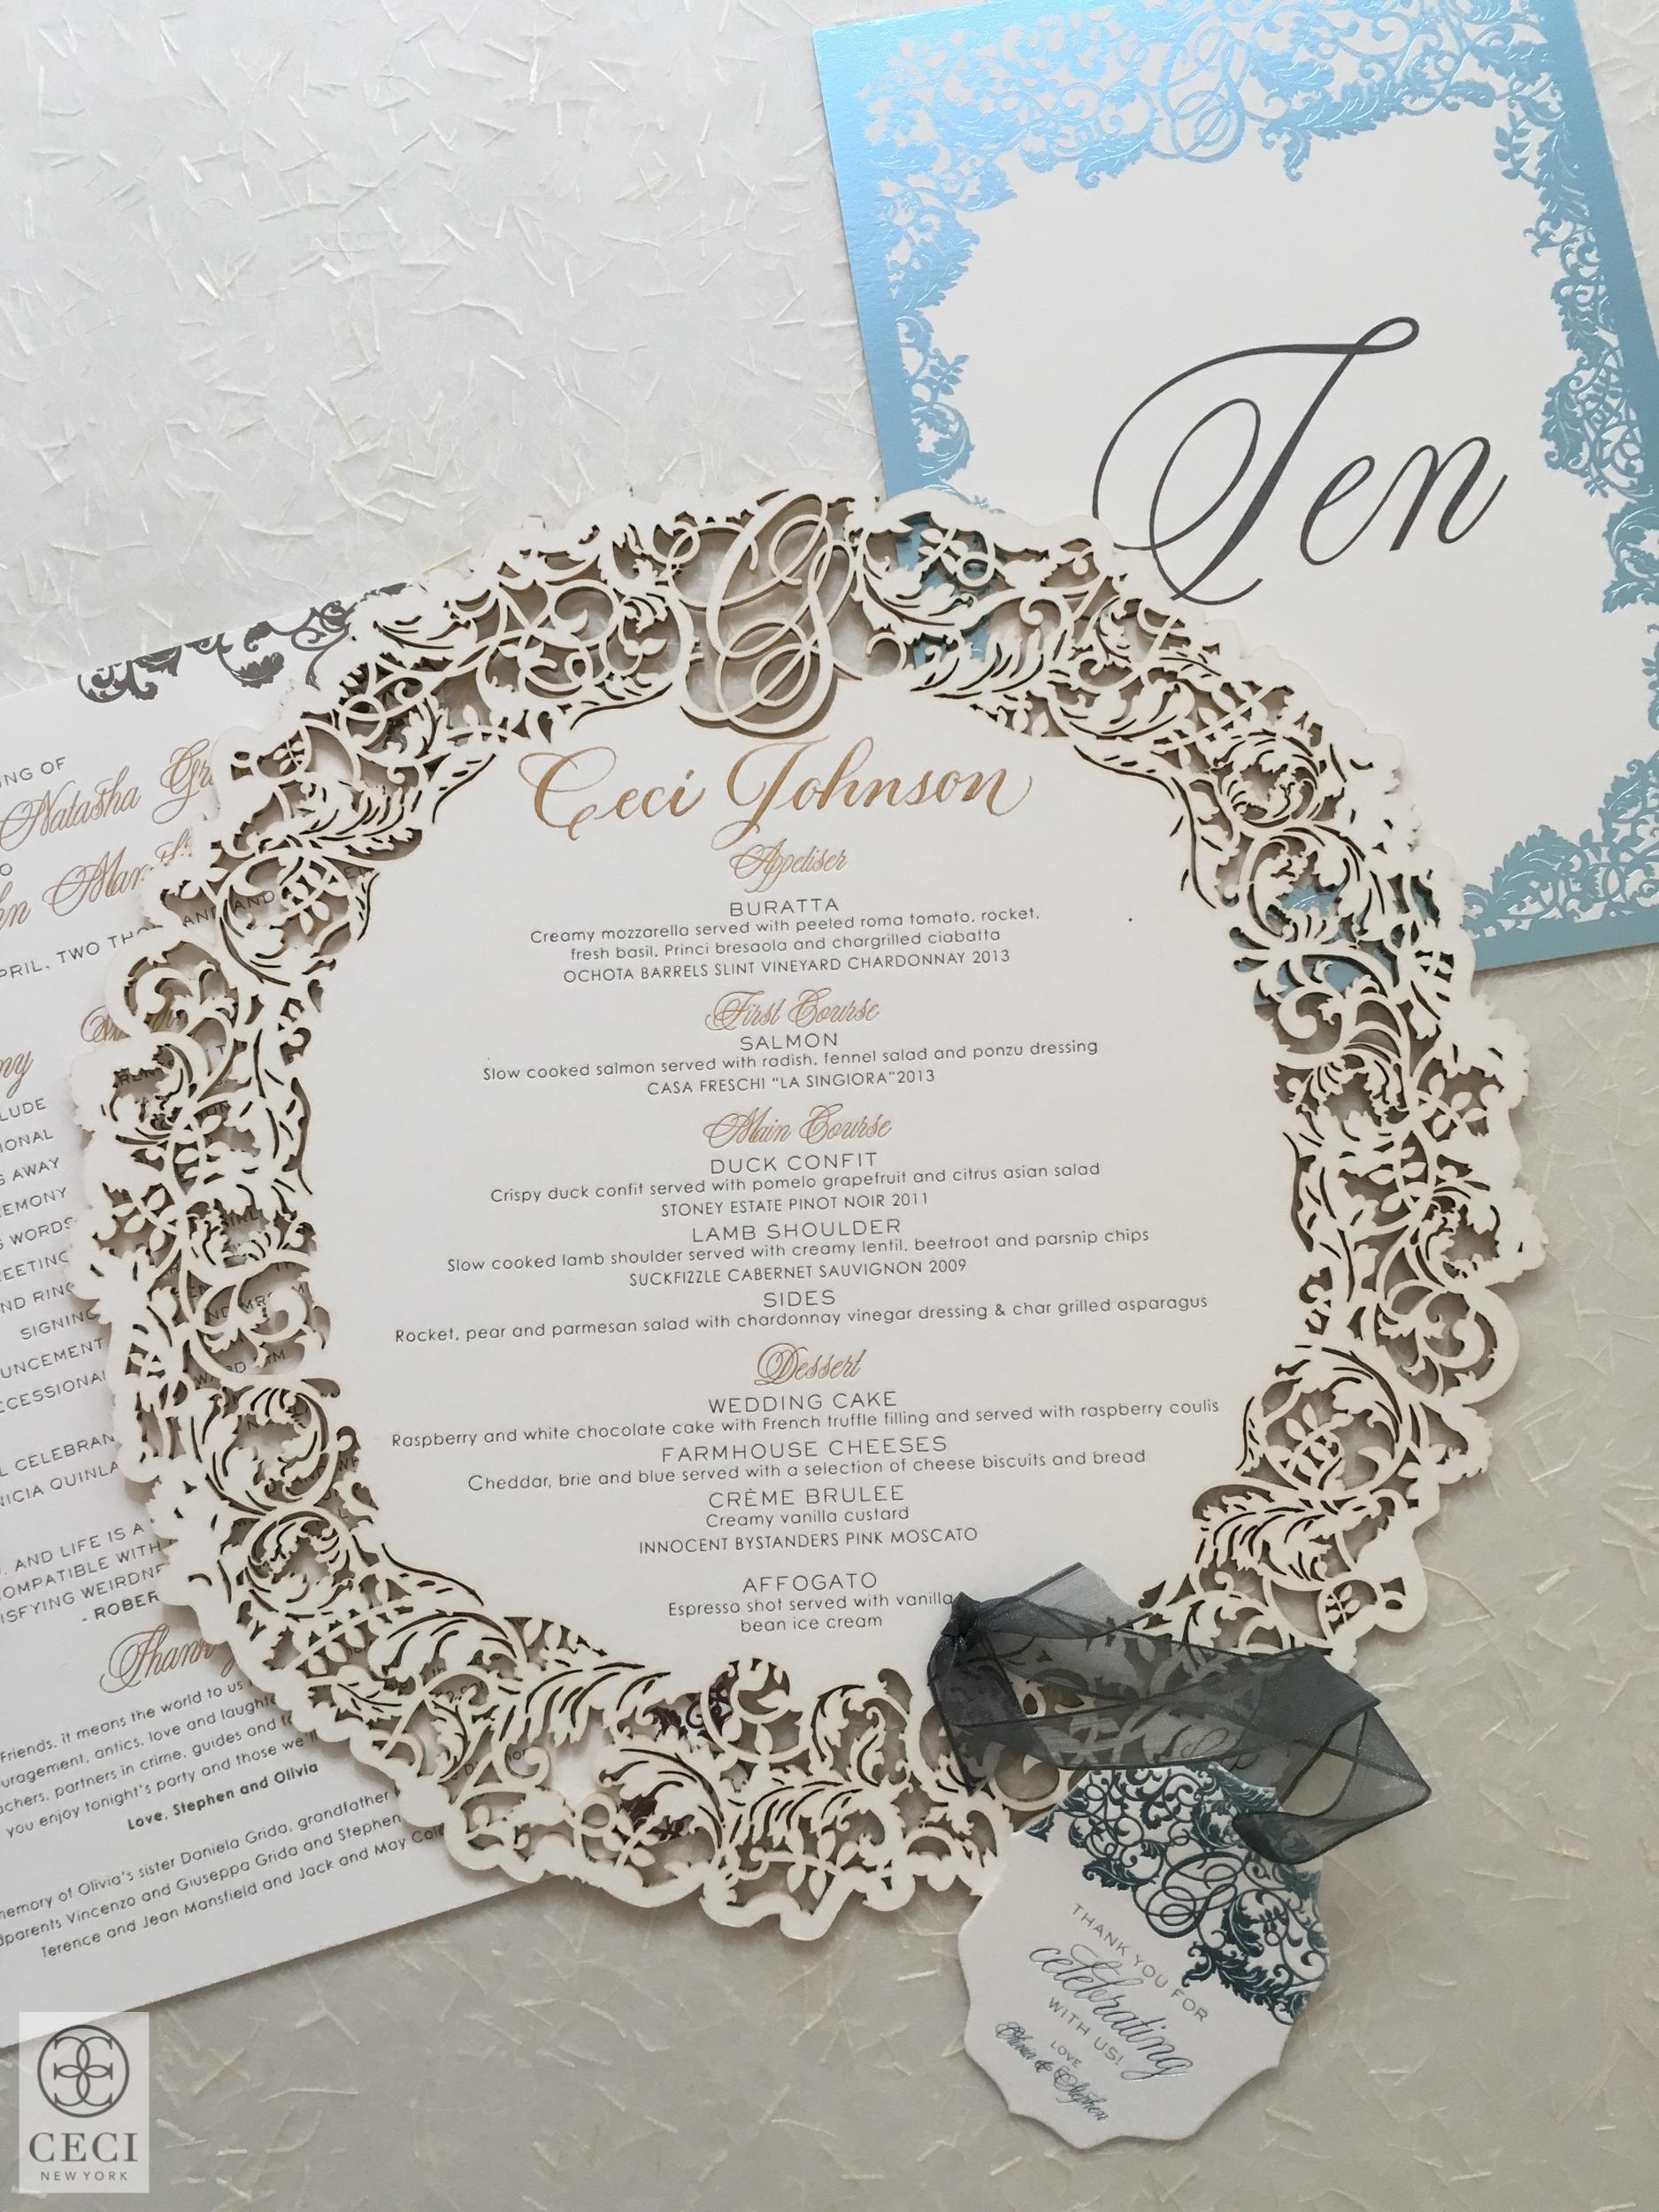 v2Ceci_New_York_Custom_Luxury_Wedding_BeautyShot_LaserCut_Stationery_Personalized_Couture_Foil_Stamping_Perth_Destination_Australia_Chic_-3.jpg